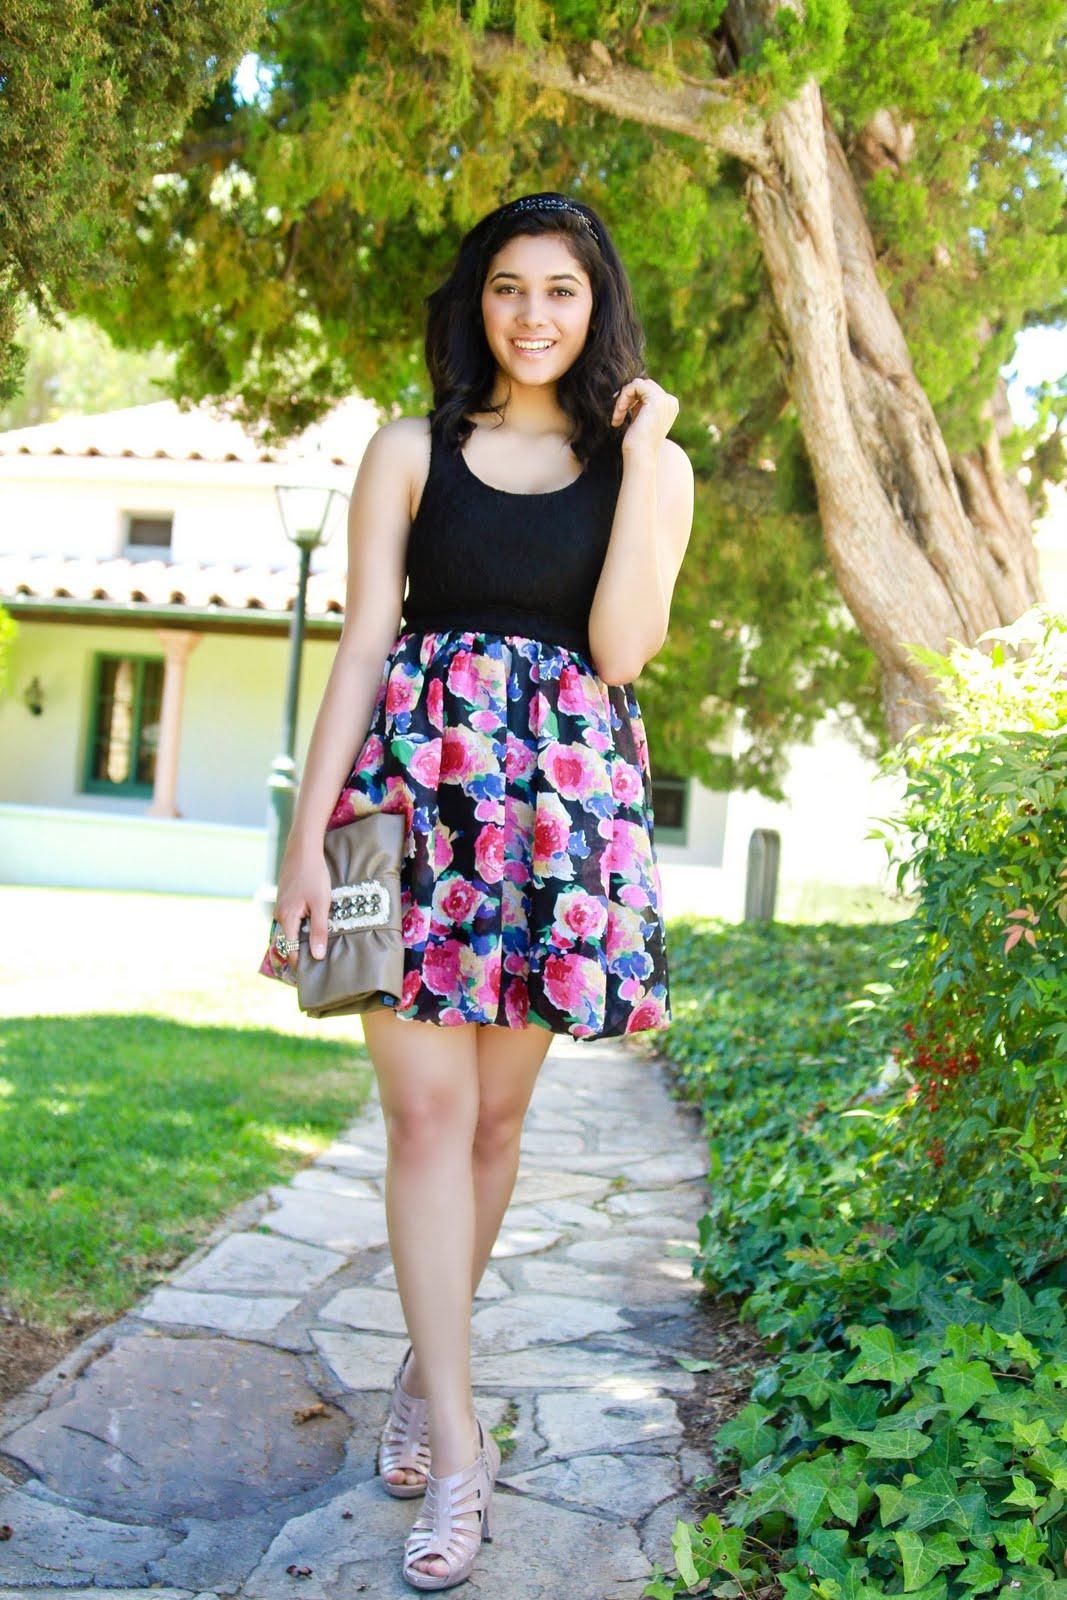 Teen models portfolios